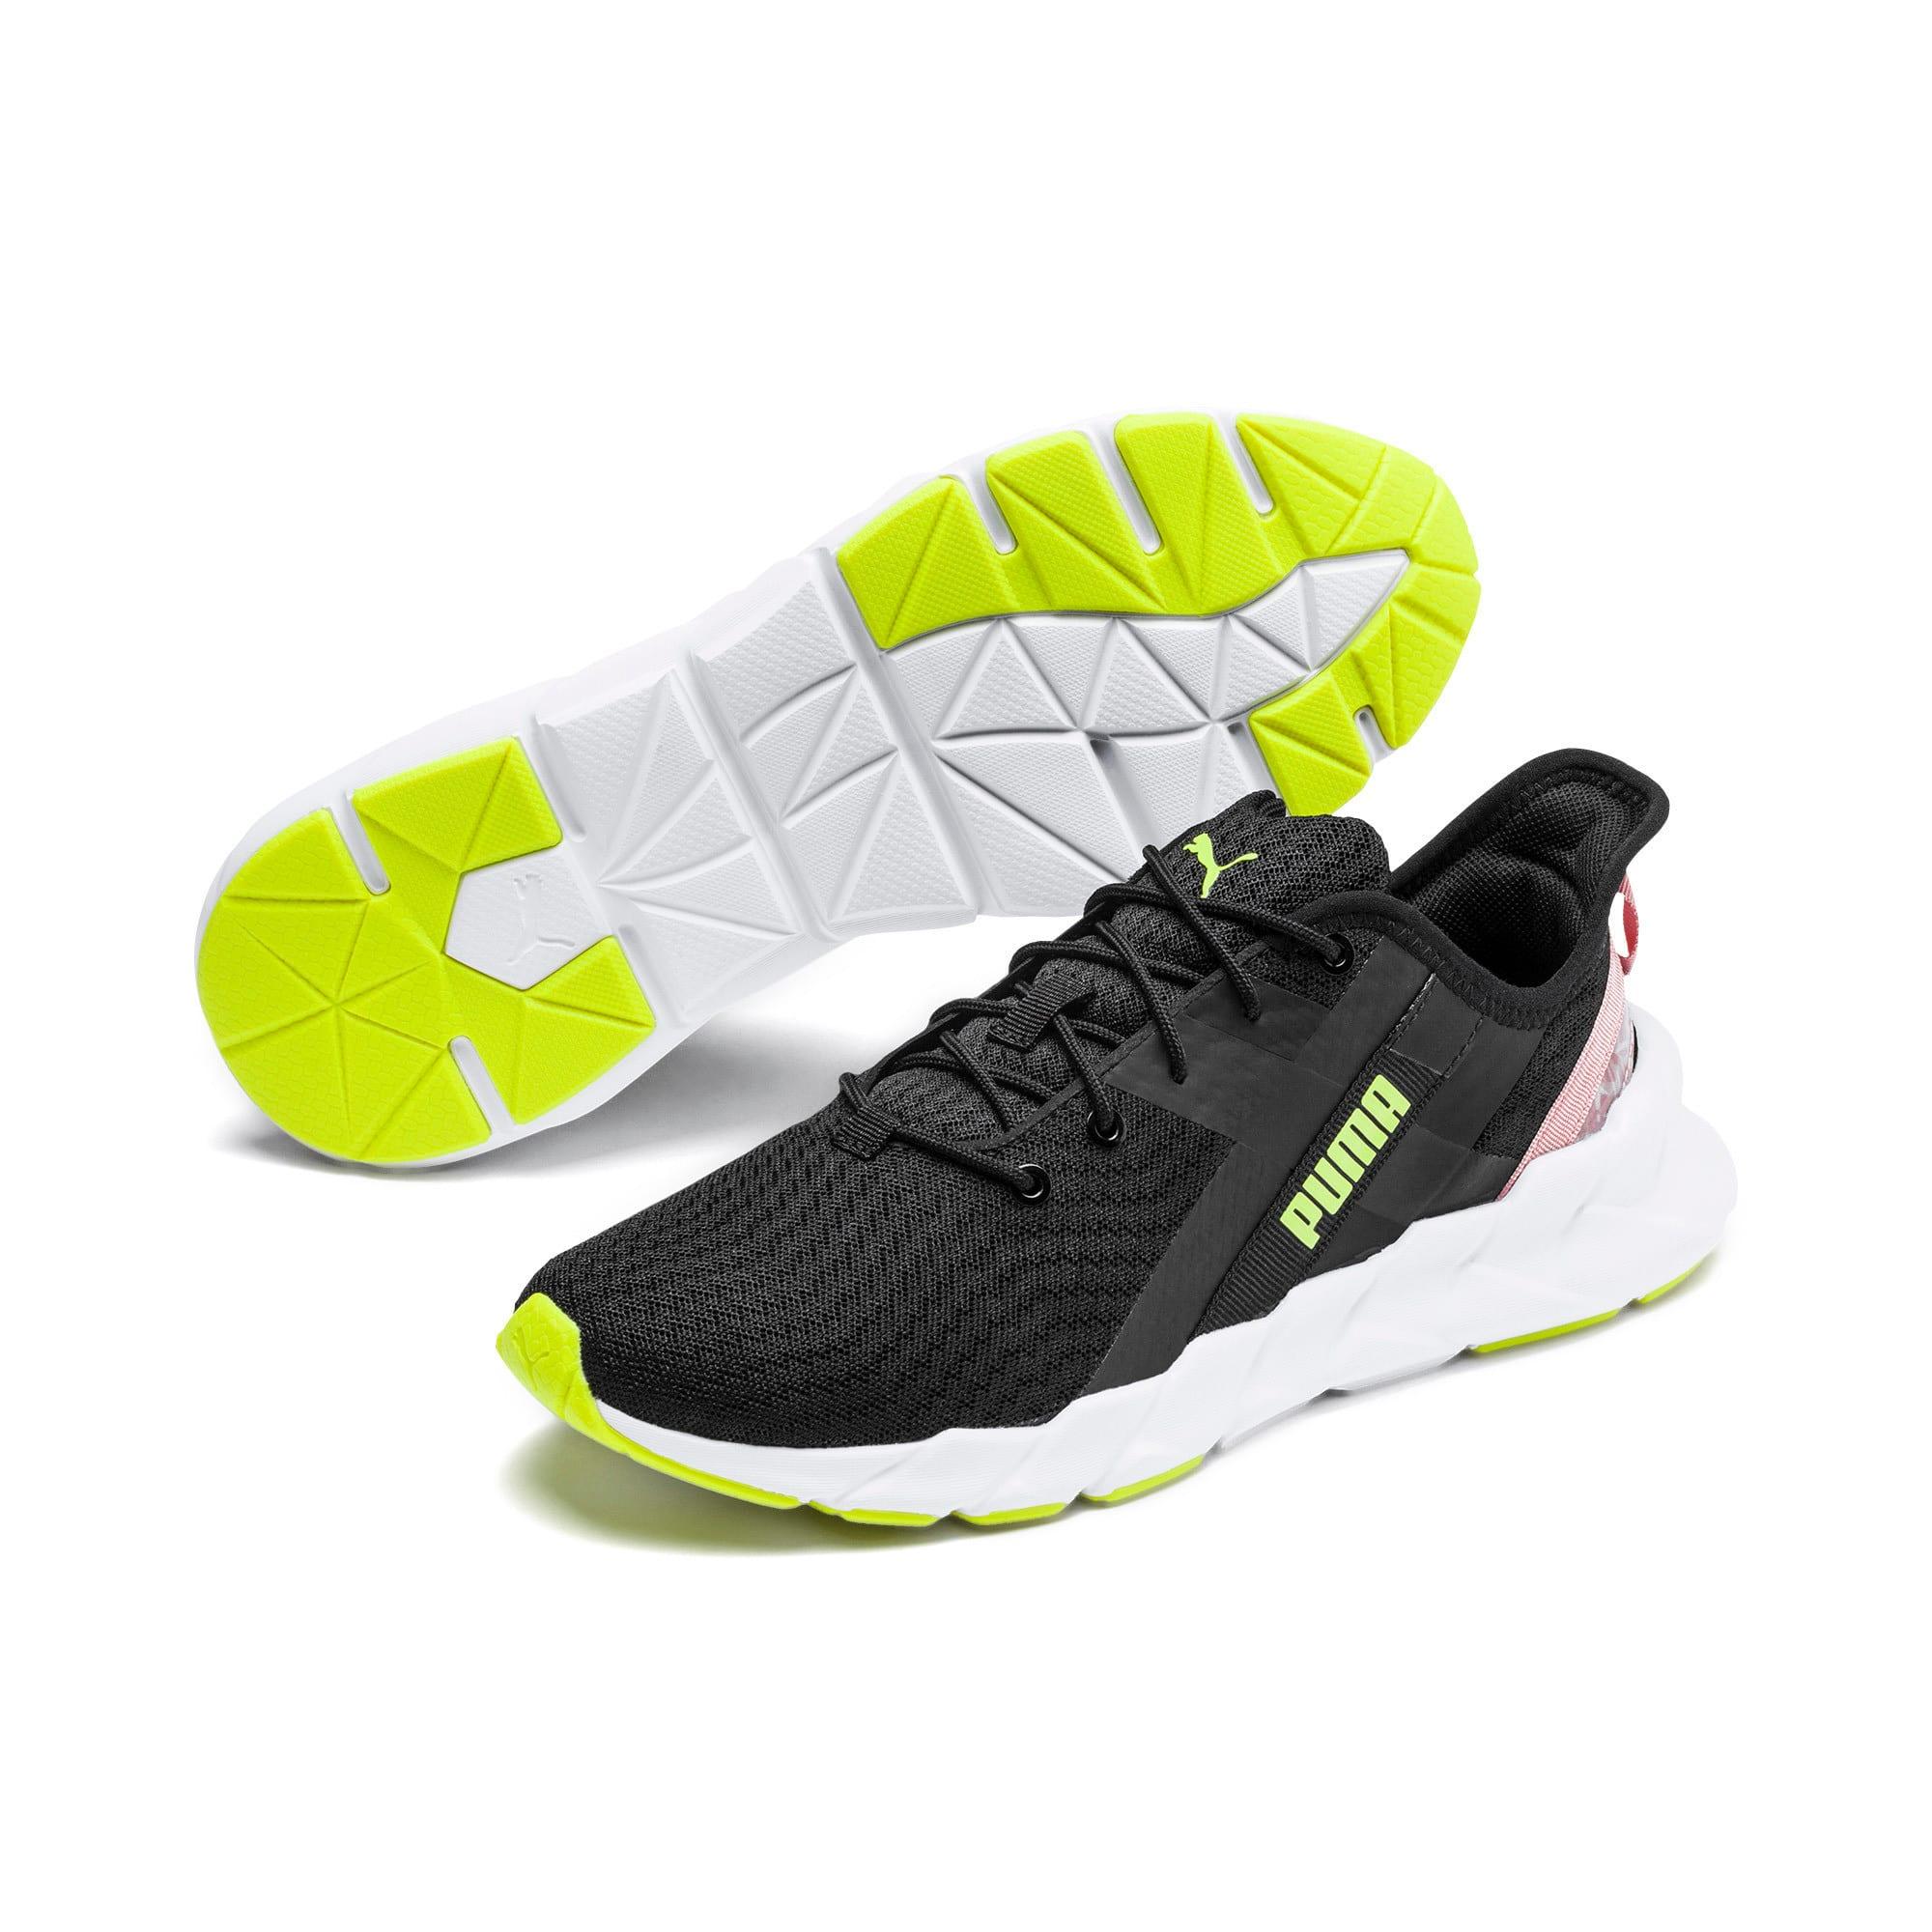 Thumbnail 3 of Weave Shift XT Women's Training Shoes, Puma Black-Puma White, medium